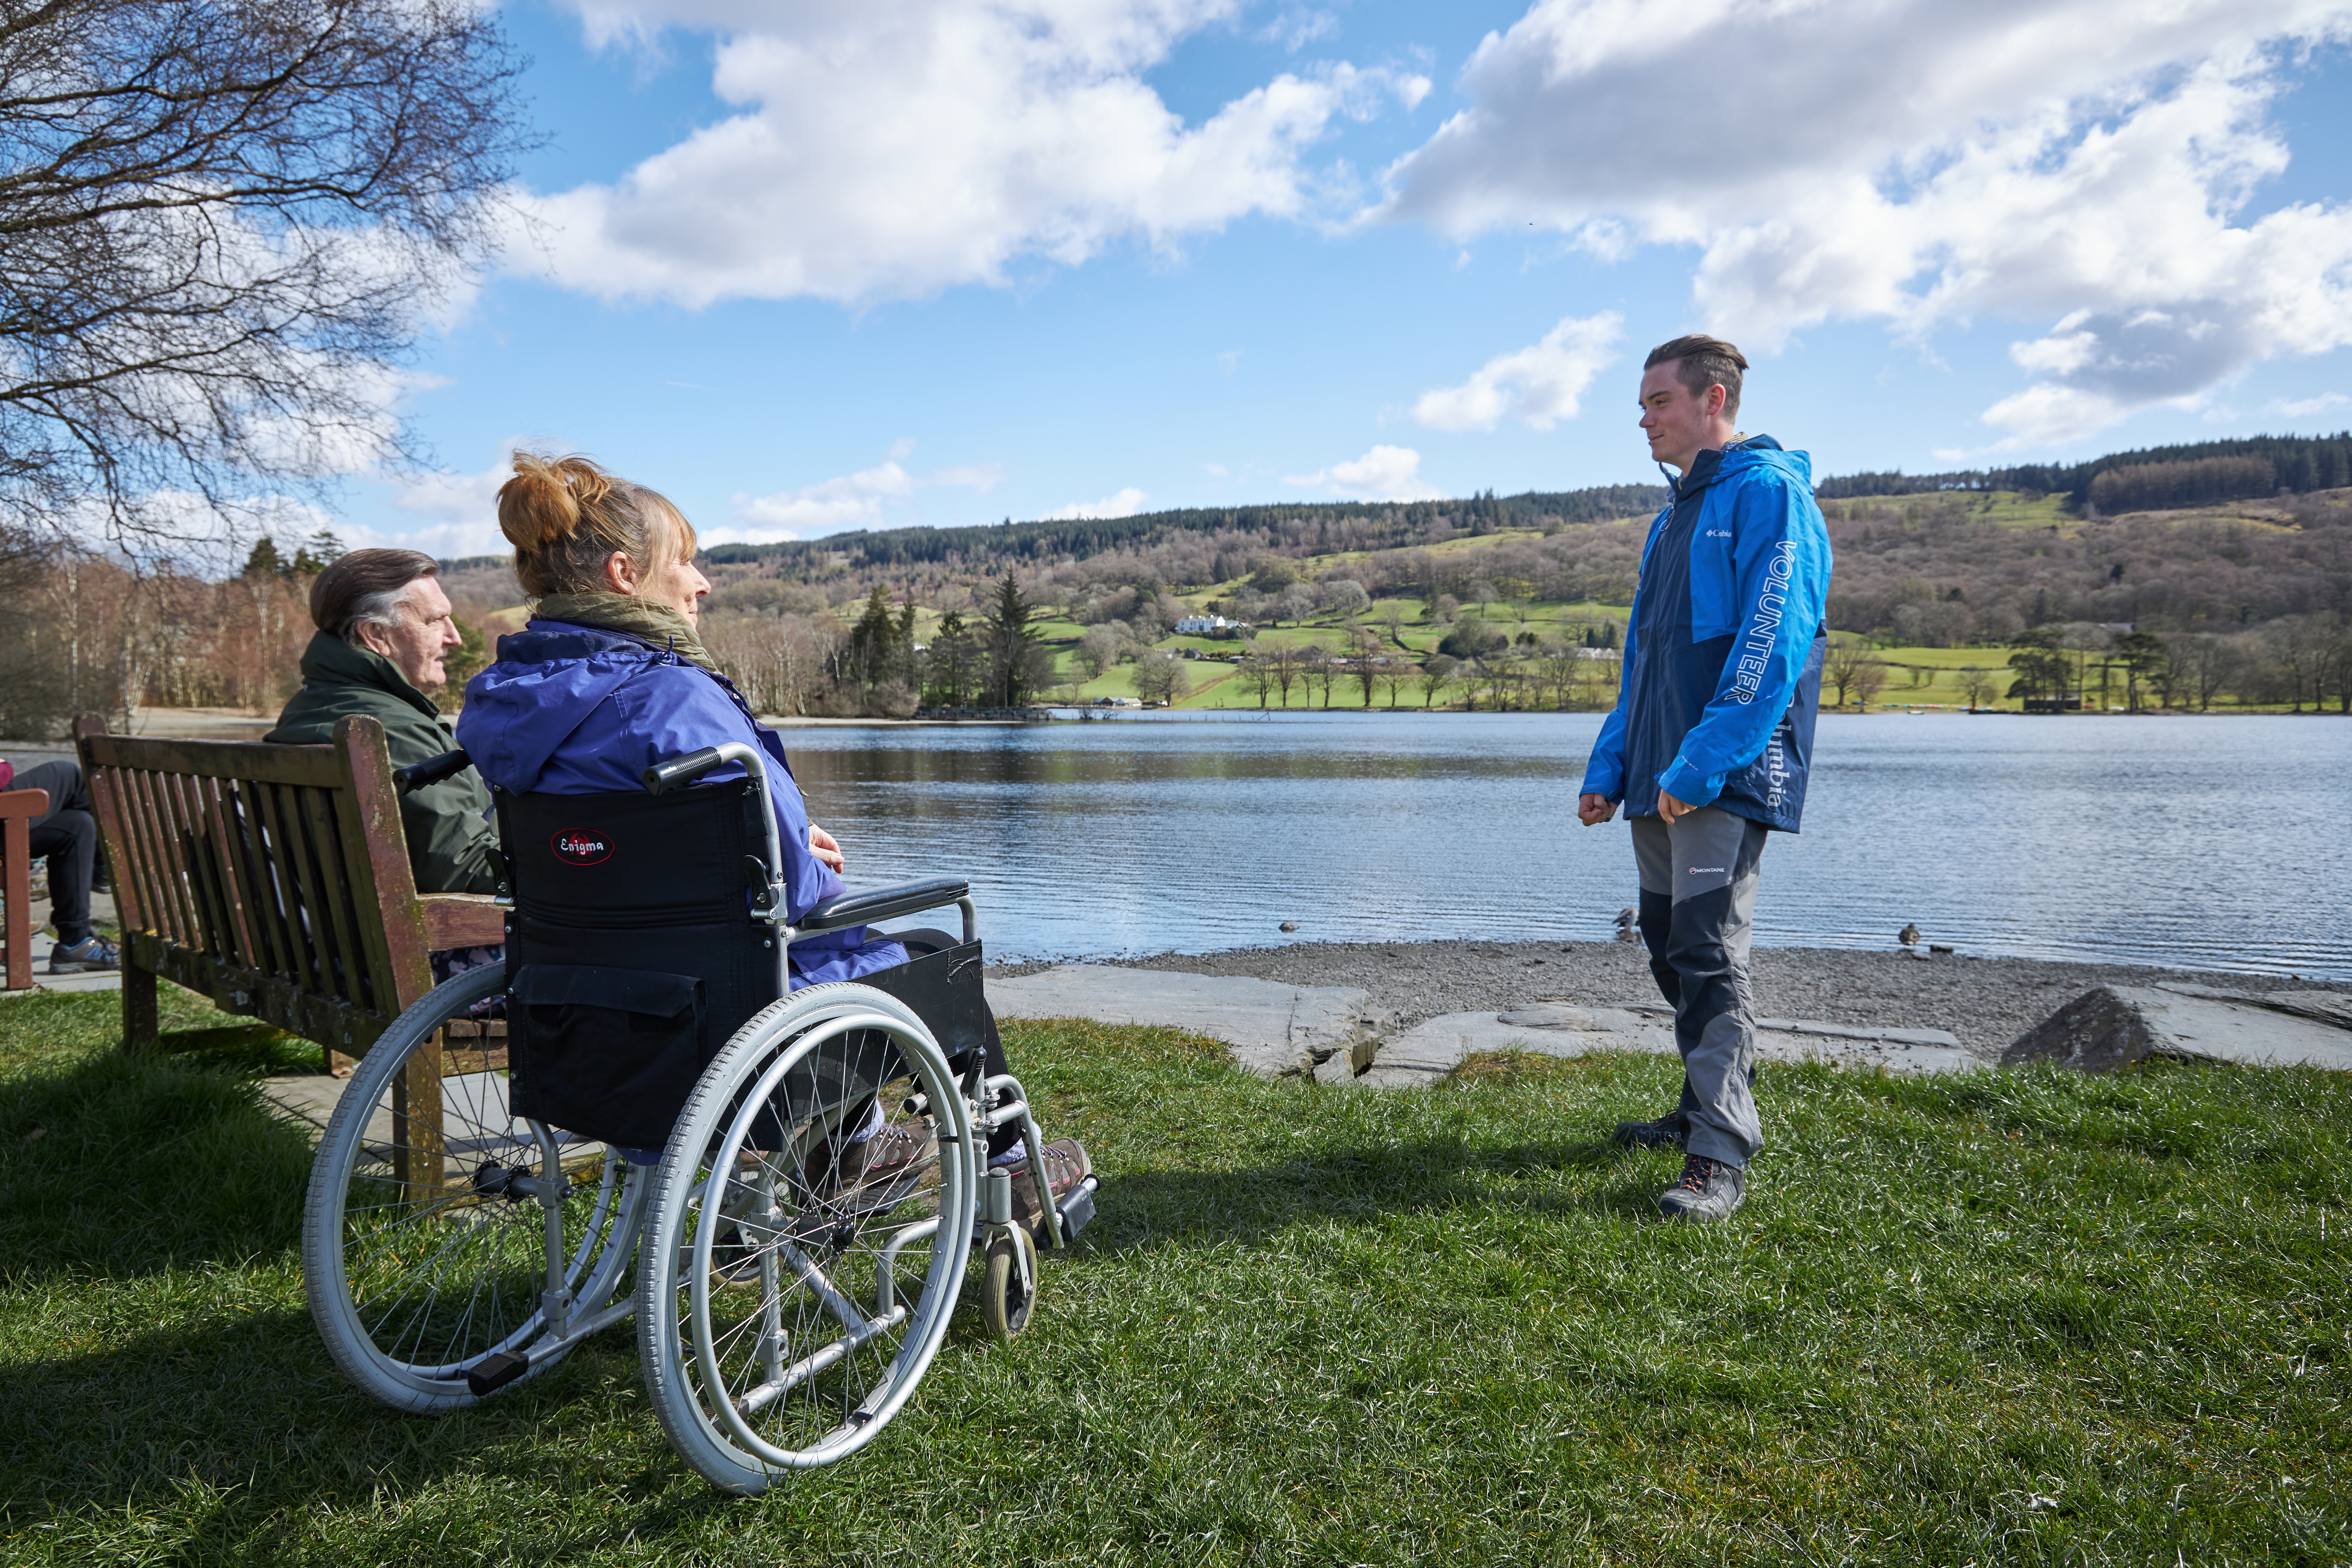 Wheelchair user by a lake shore - Adrian Naik